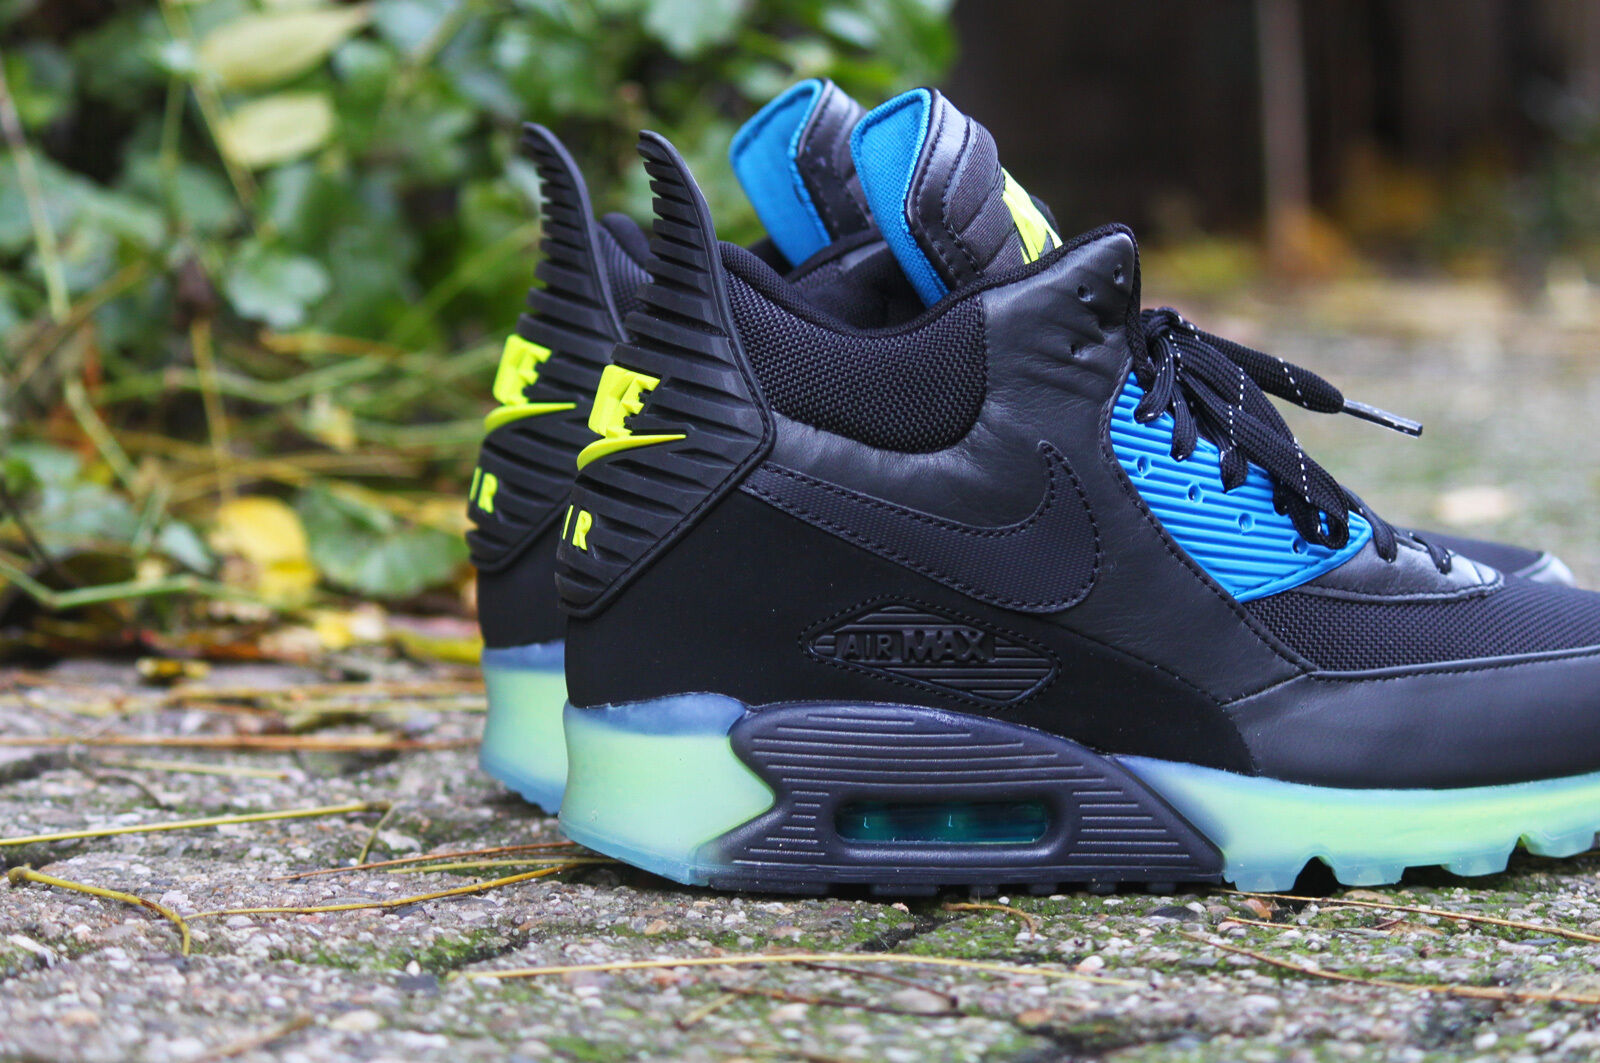 Nike Air Max 90 Sneakerboot Ice 684722 001 Sz 8.5 Black Ash